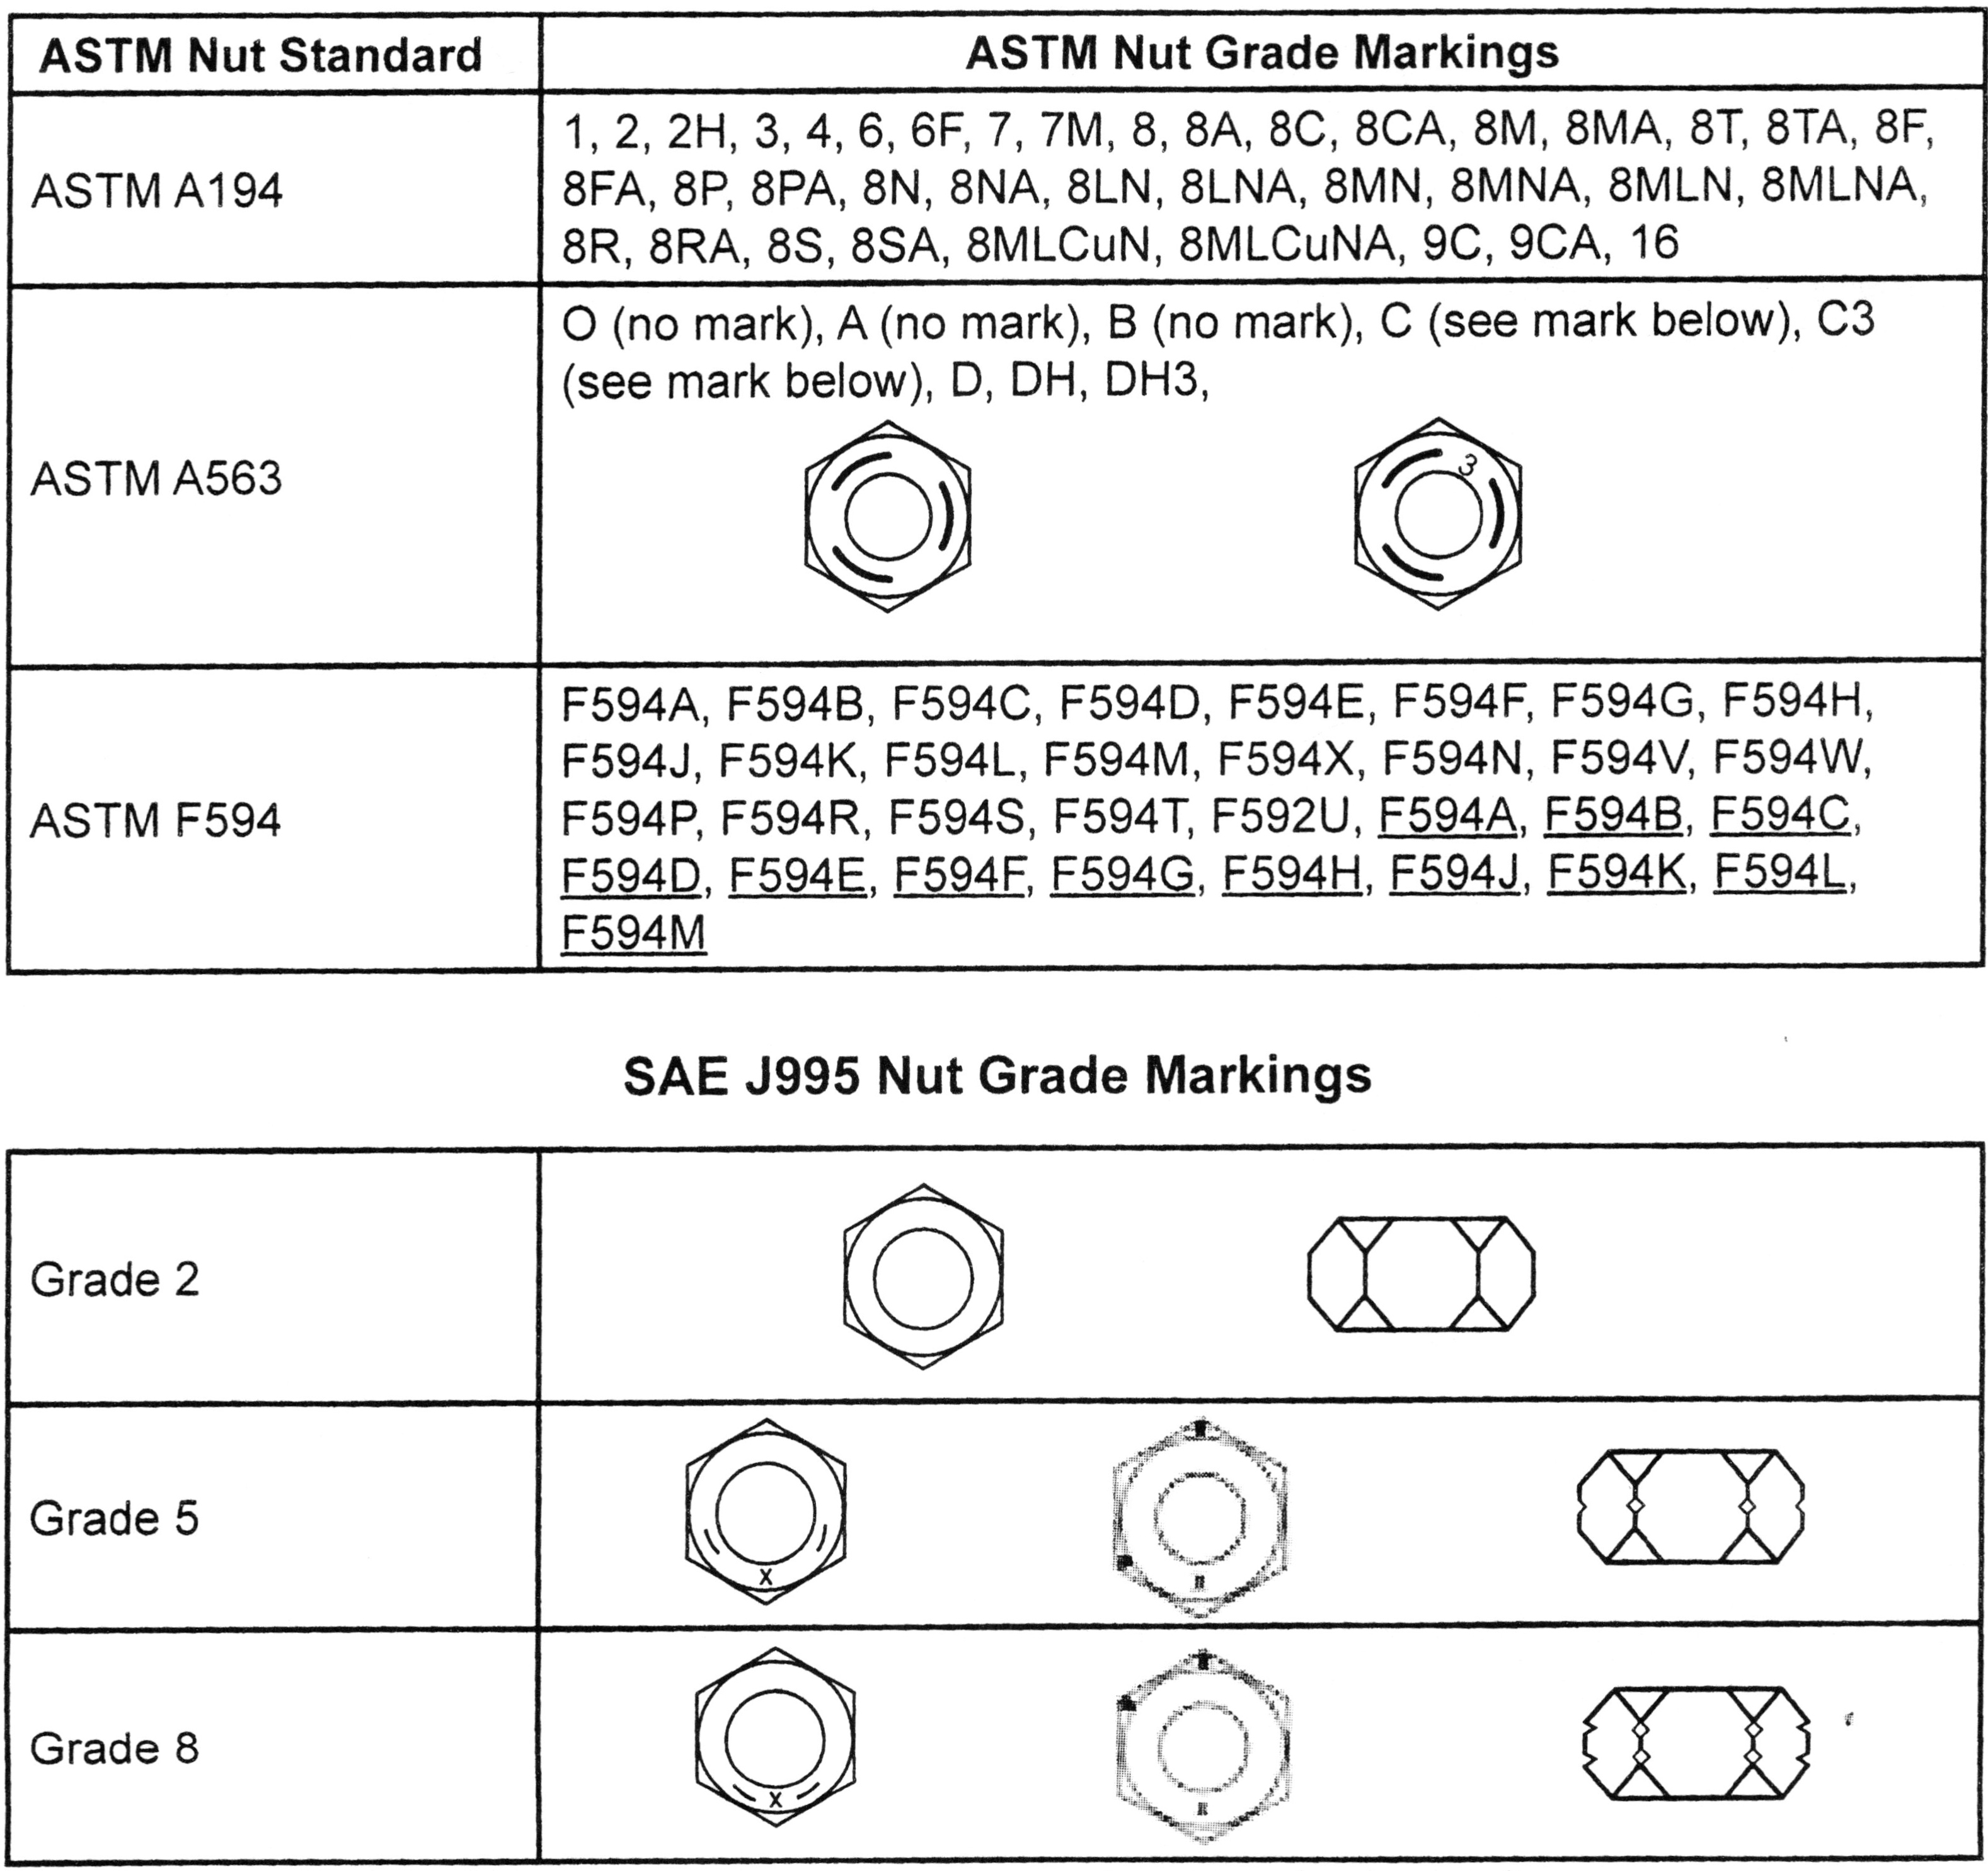 Nut head marking chart zero products inc nut head marking chart nvjuhfo Gallery